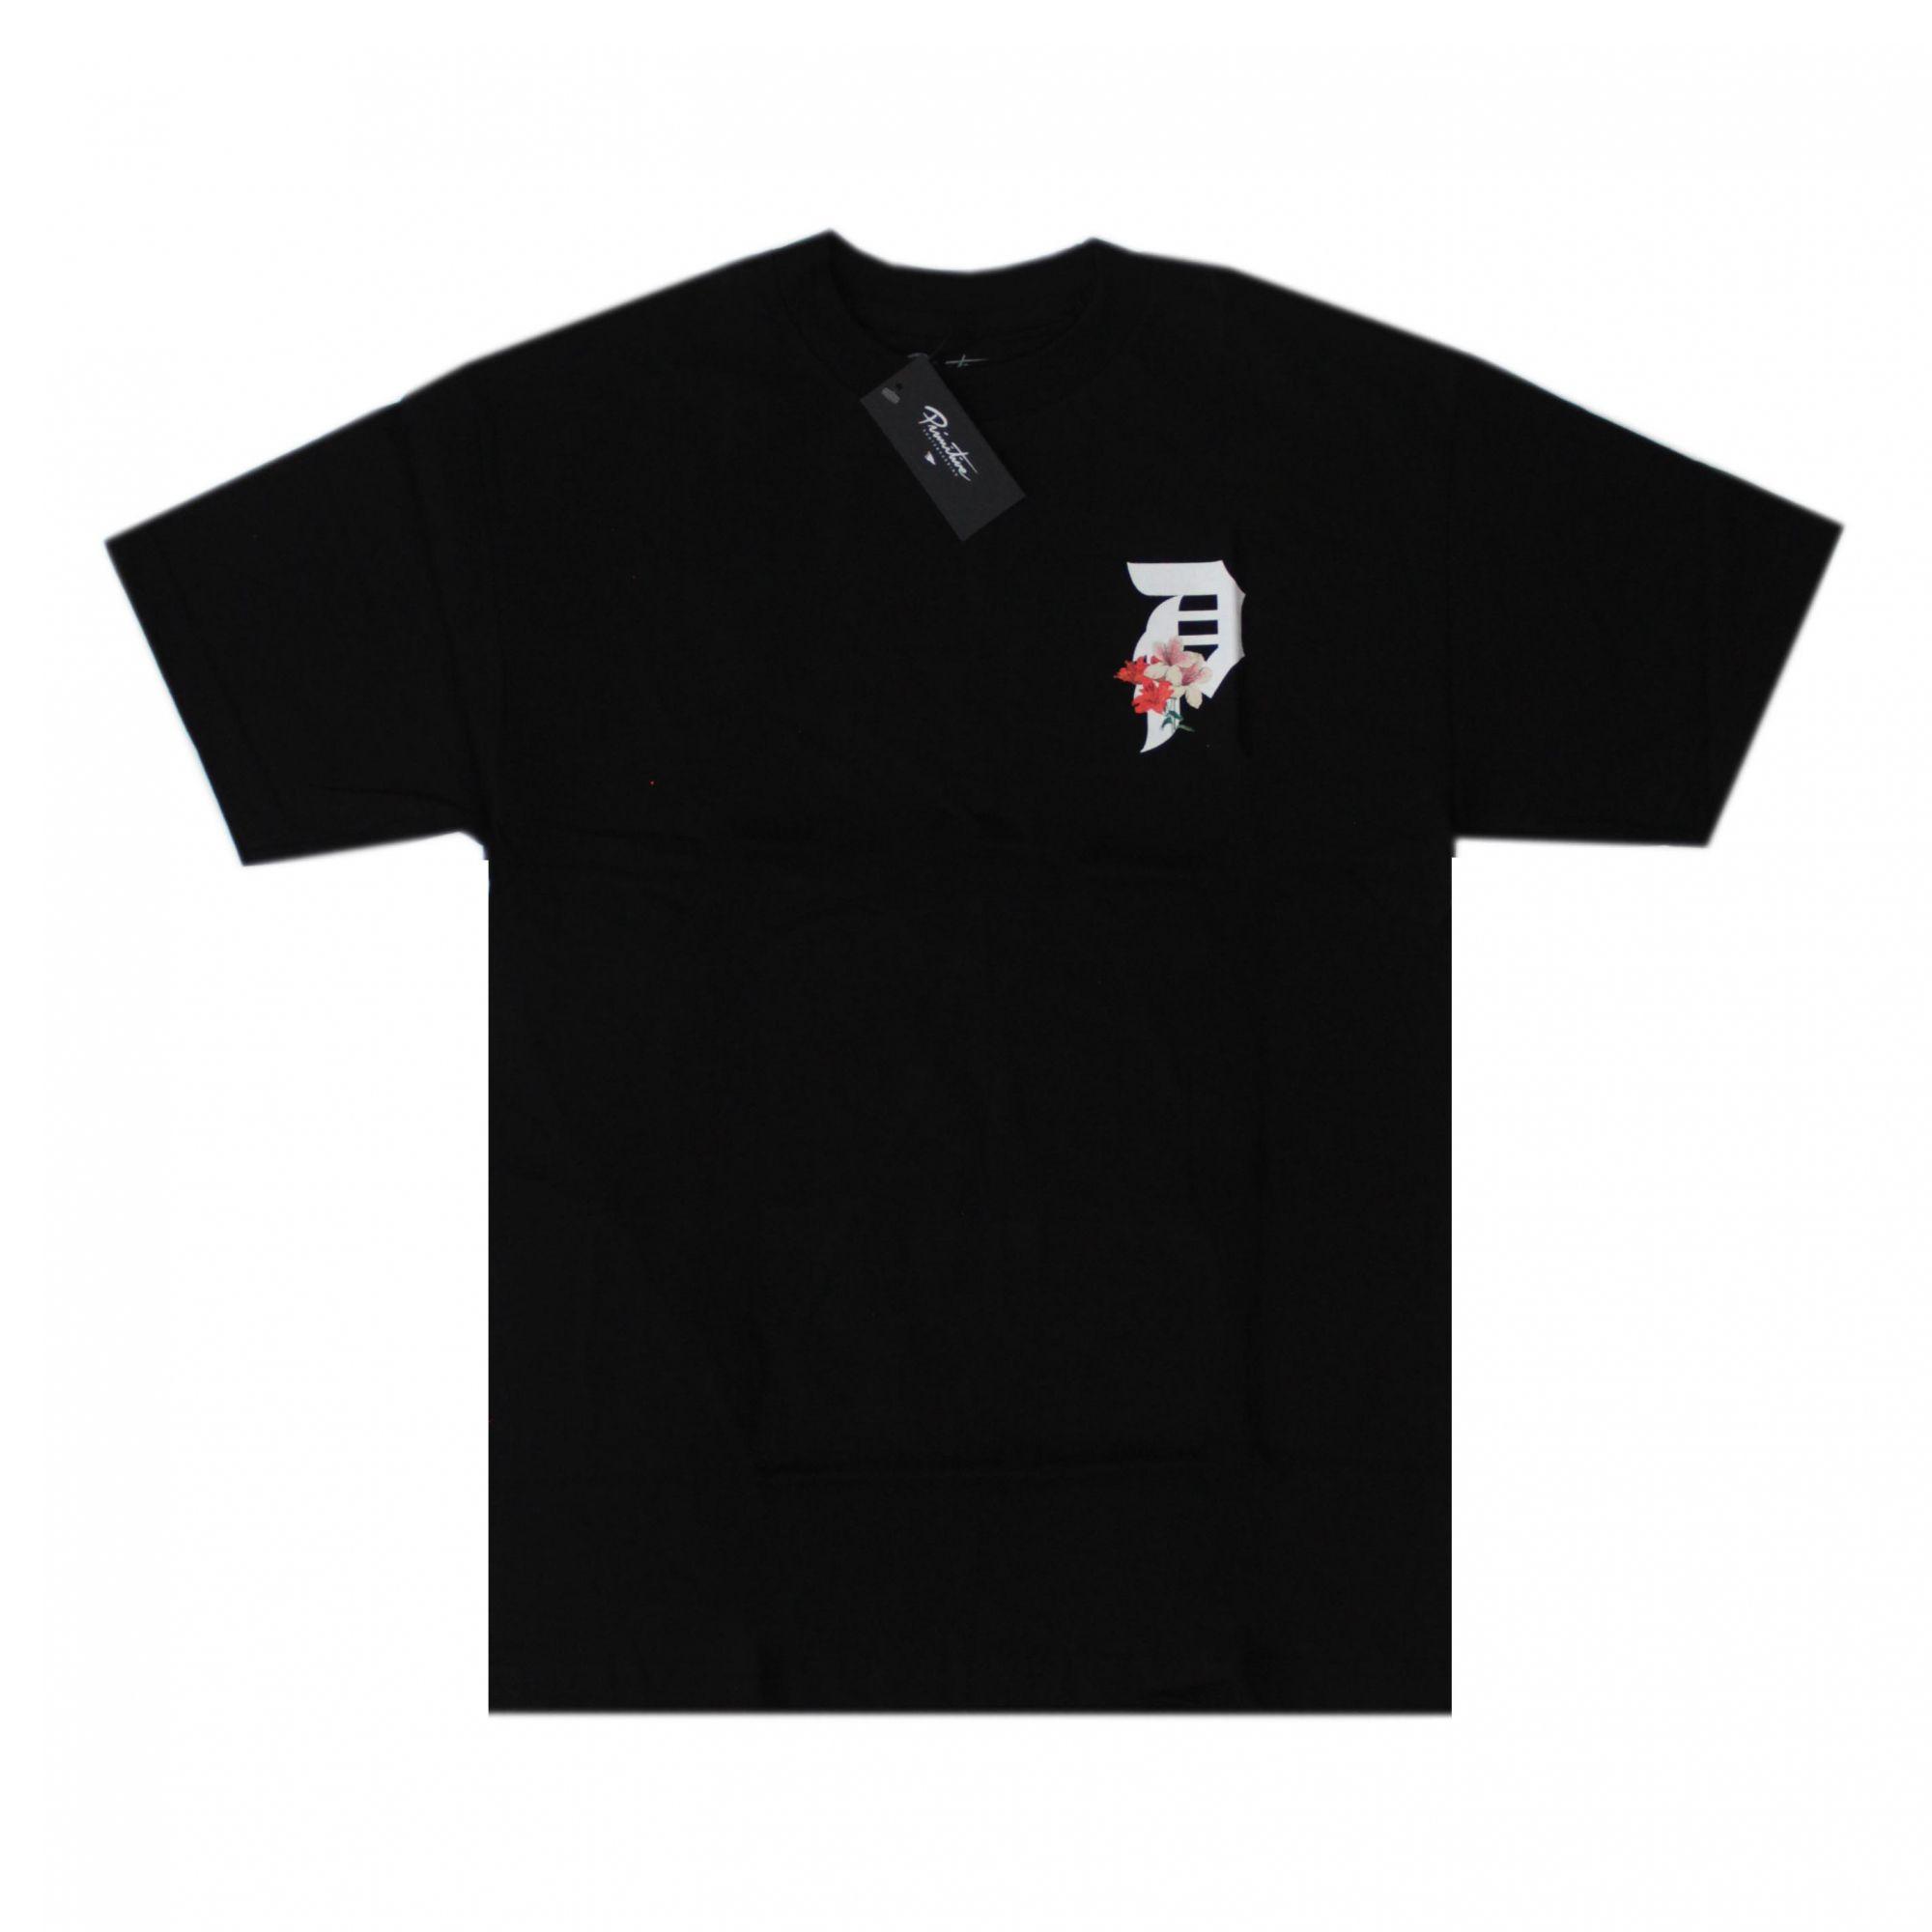 Camiseta Primitive Dirty P Casual Tee Preto P Lily Tee Preto